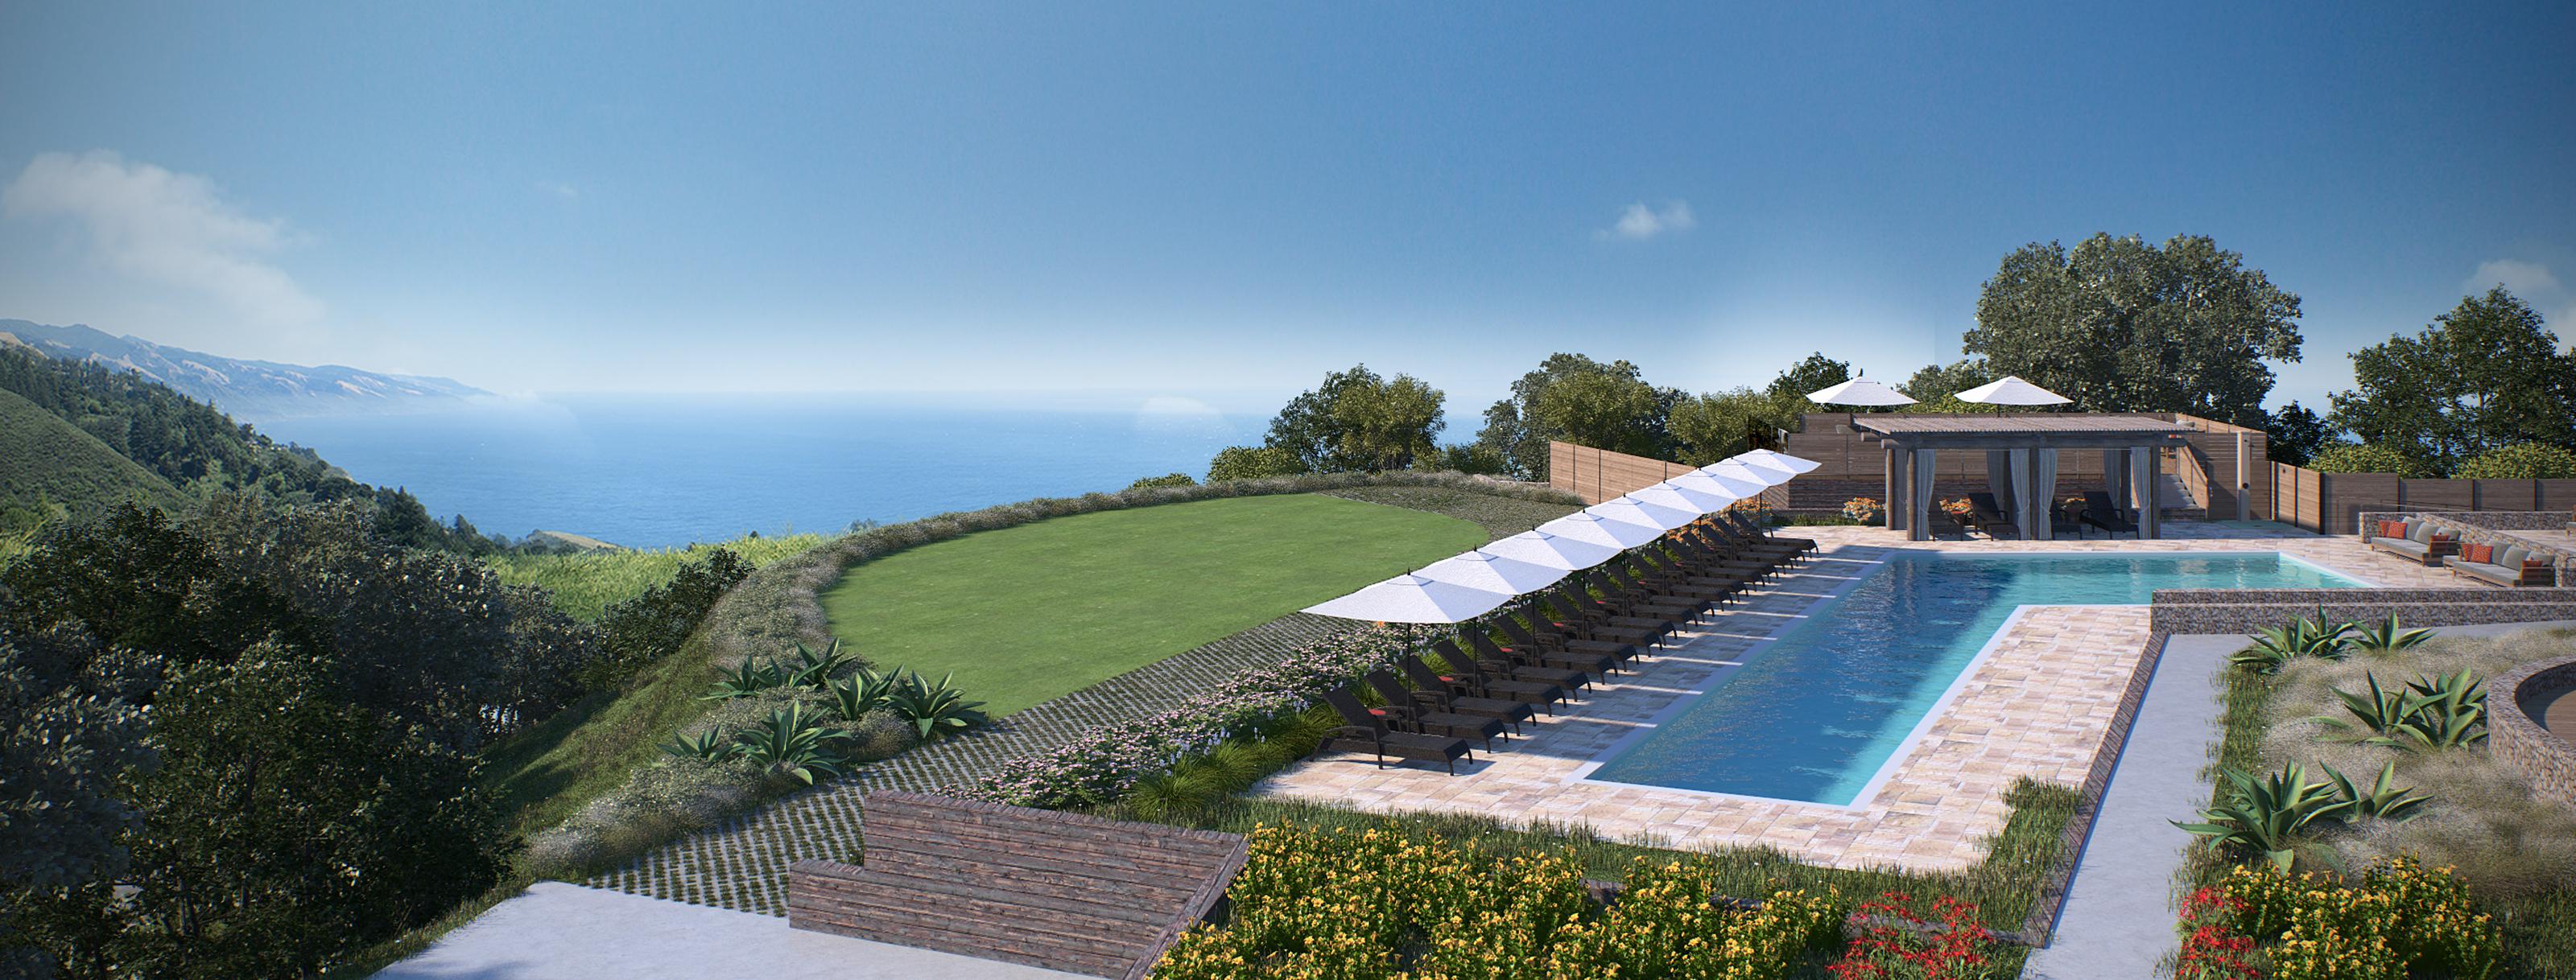 Ventana big sur announces multimillion dollar resort re for The ventana